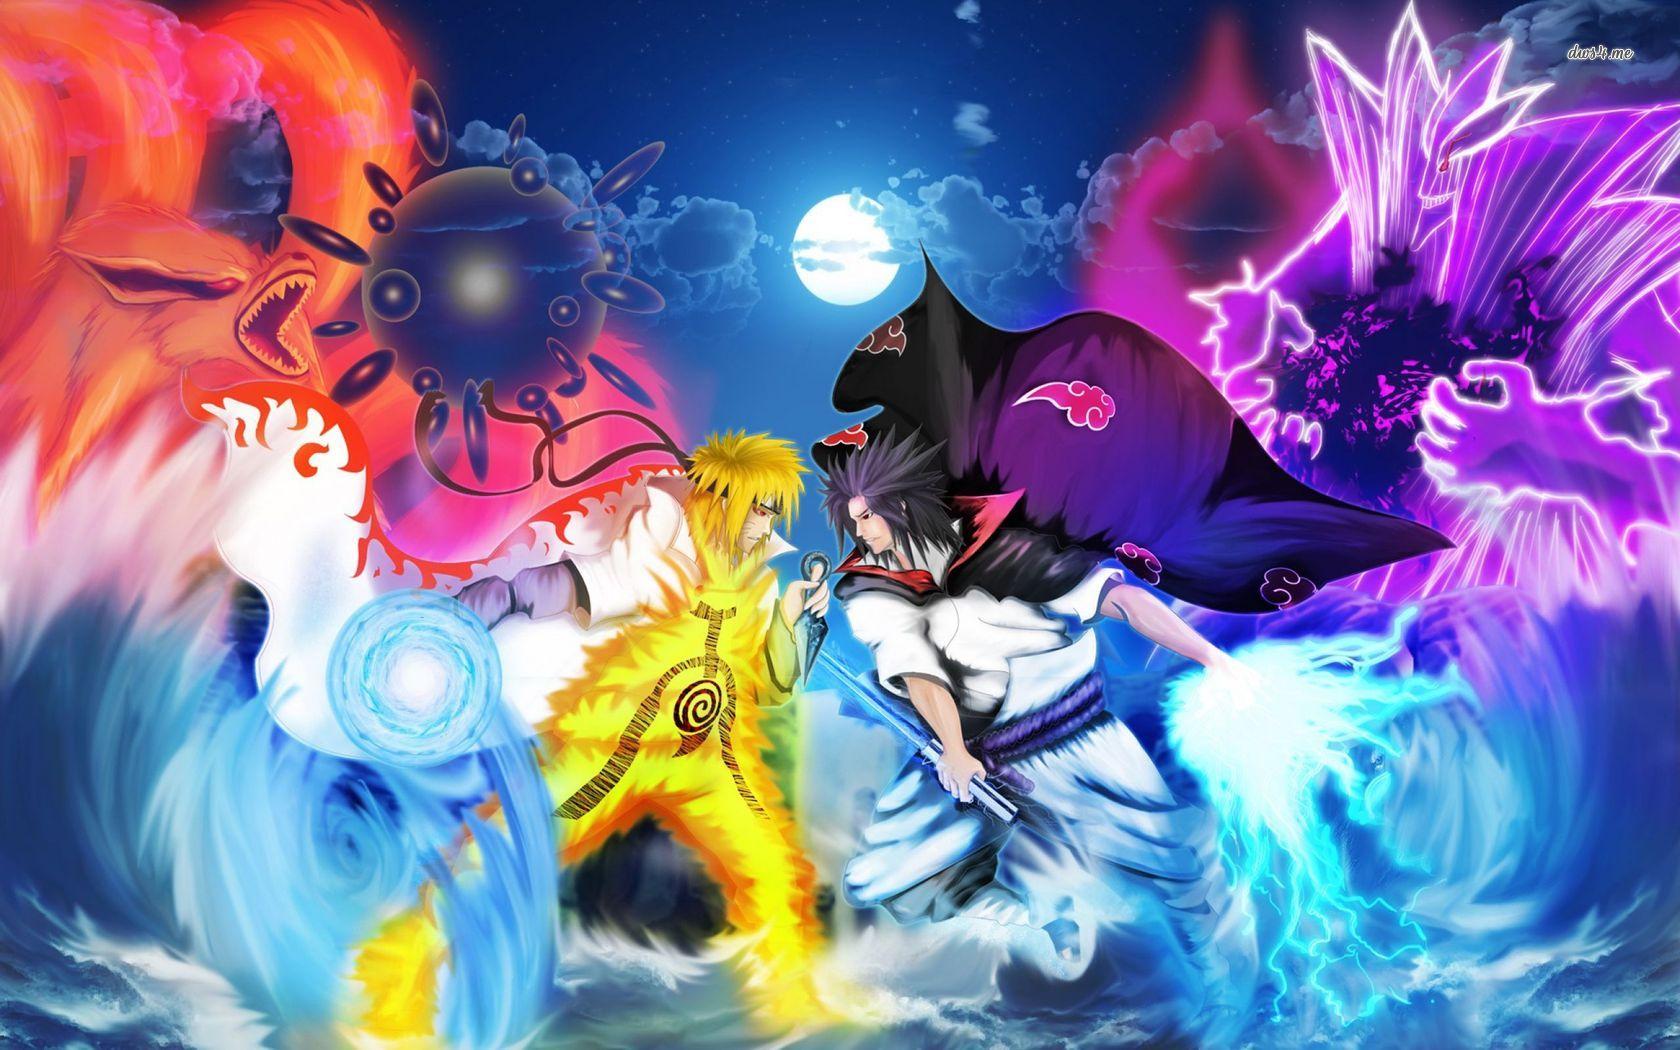 Simple Wallpaper Naruto Friend - sasuke-vs-naruto  Pic_99569.jpg